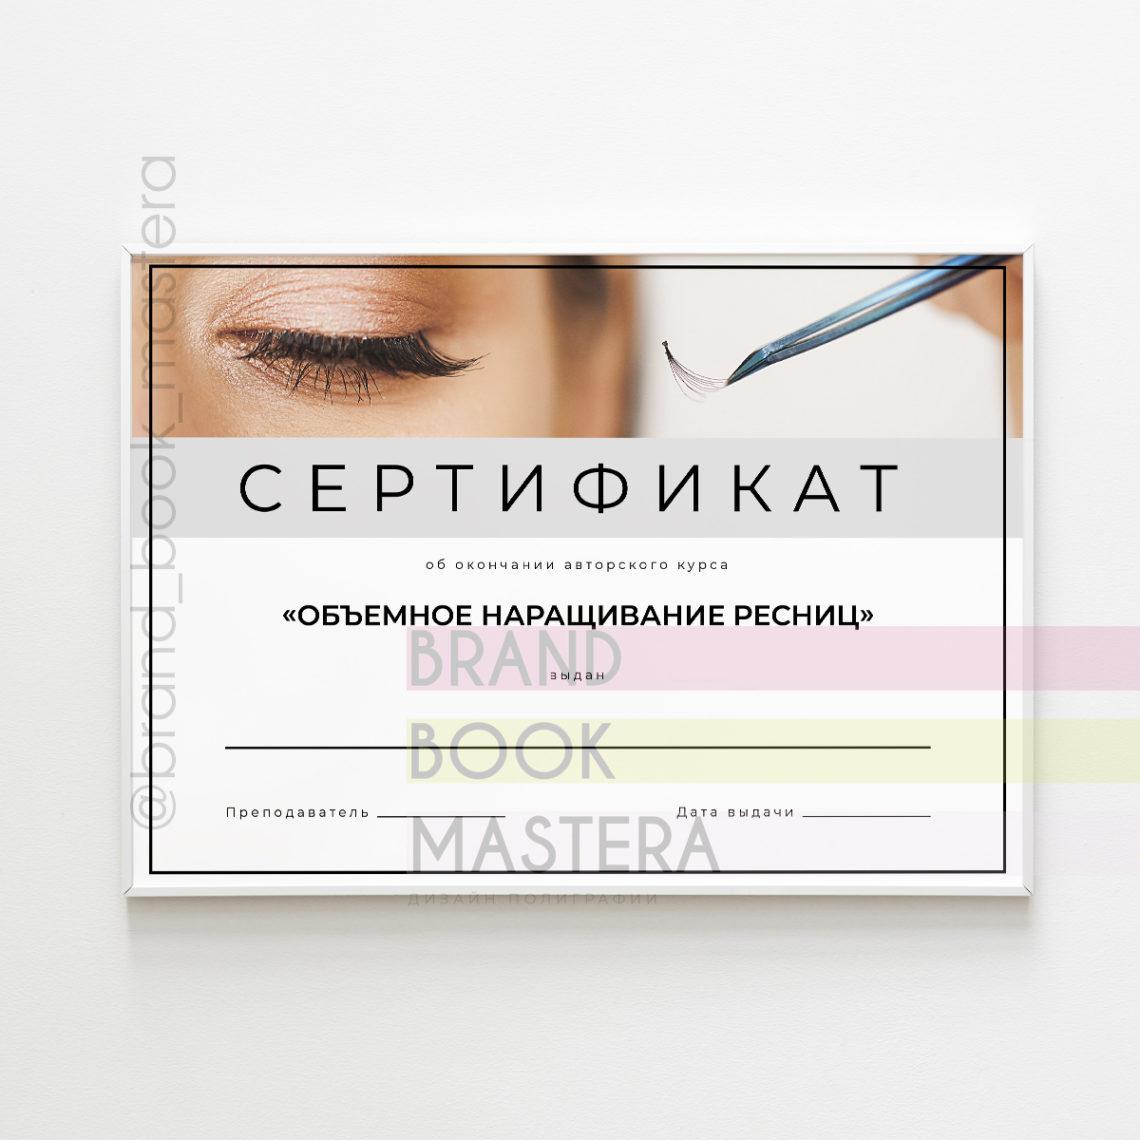 сертификат лэшмастера шаблон